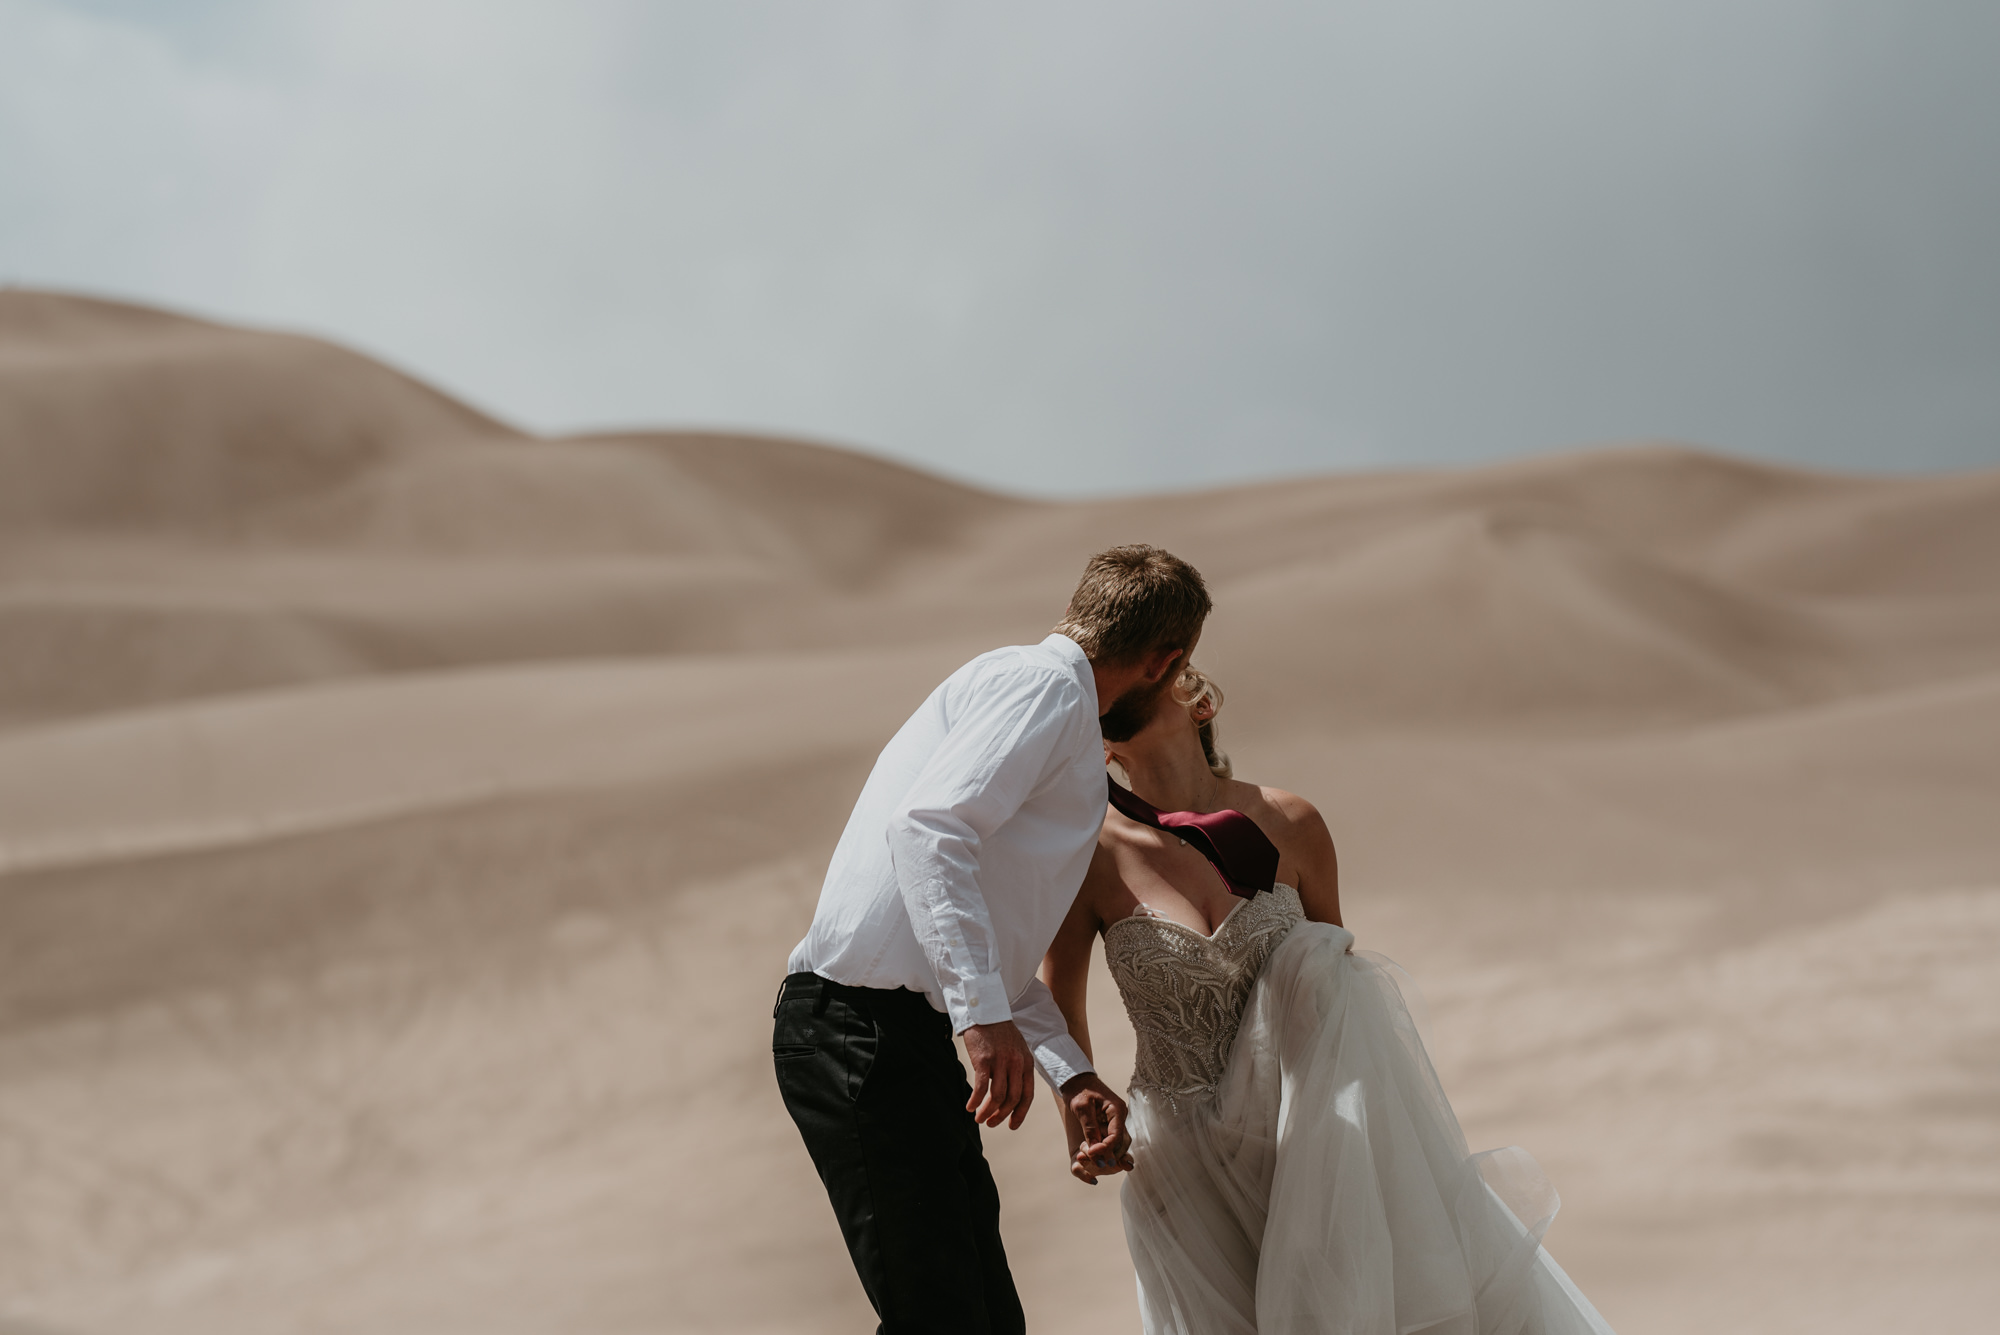 Small weddings in Southern Colorado.